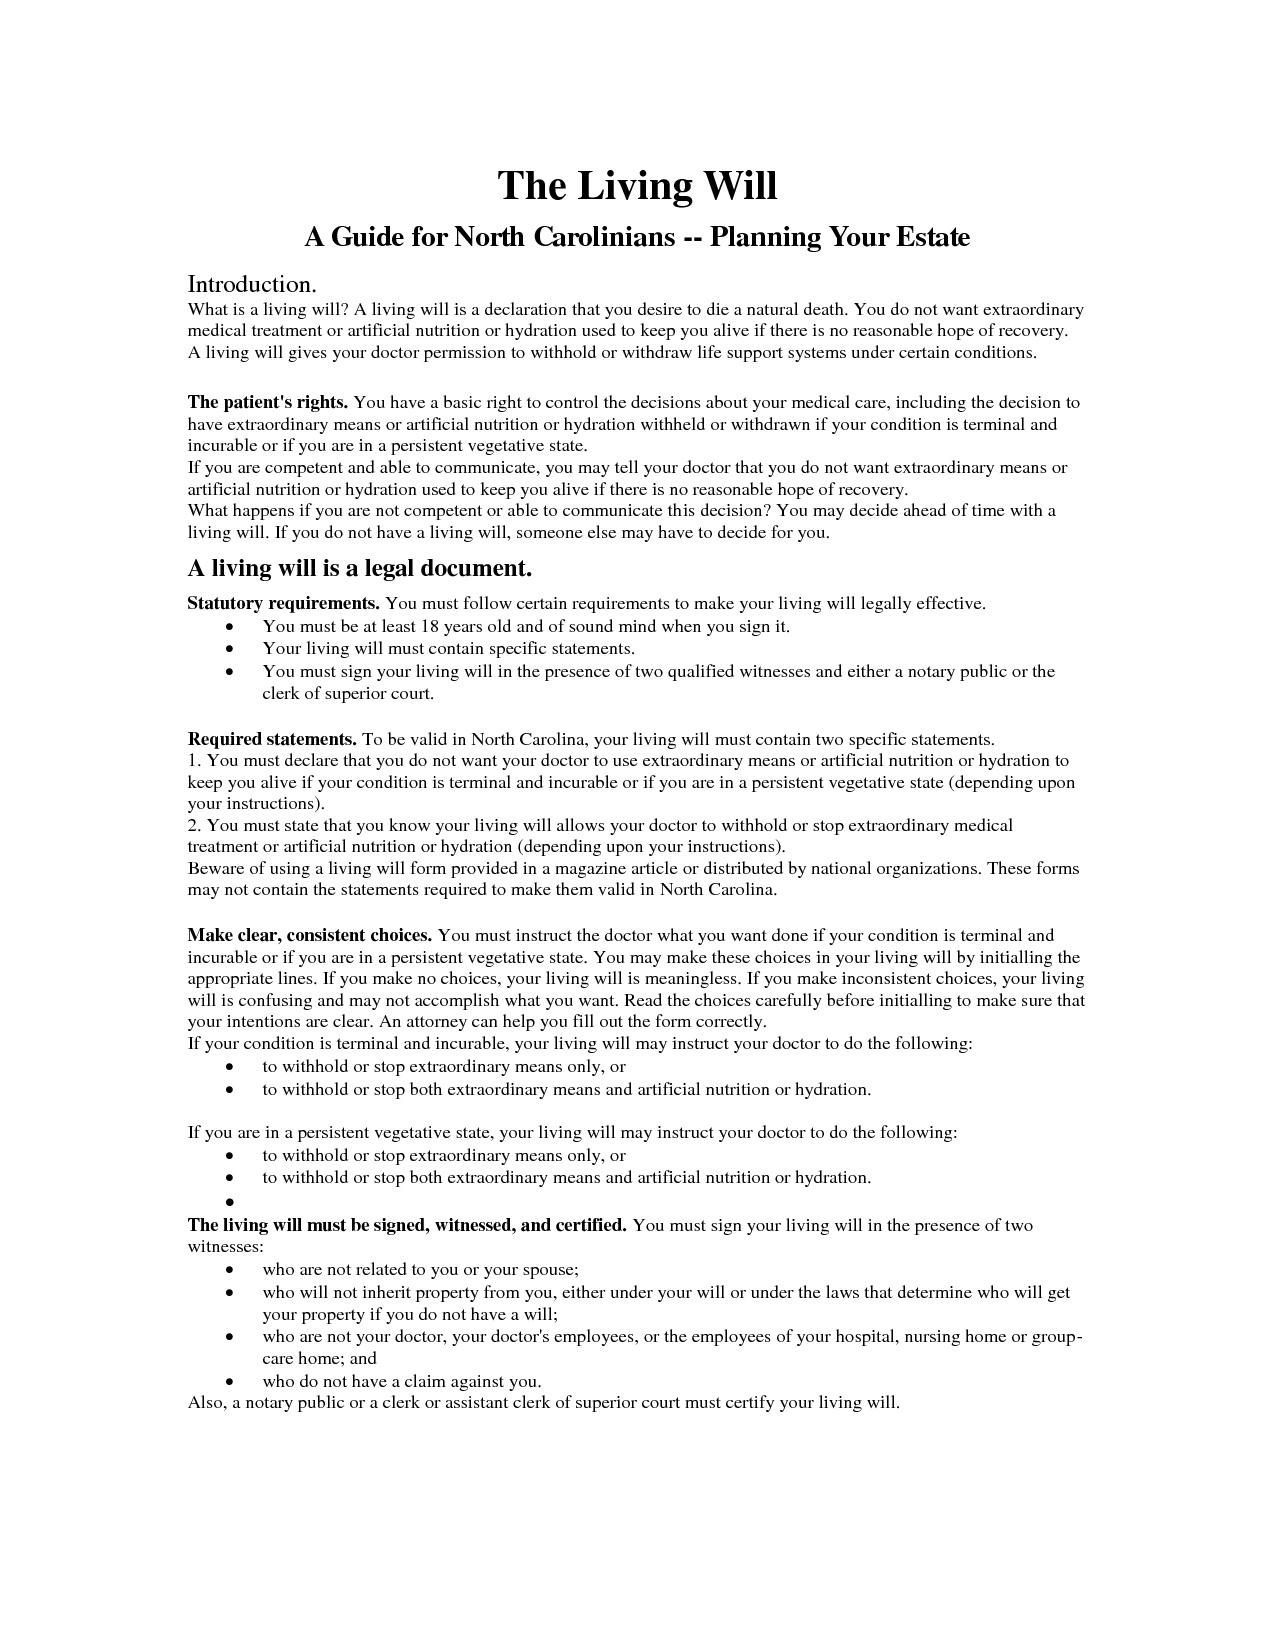 Free Printable Living Will Forms Washington State Free